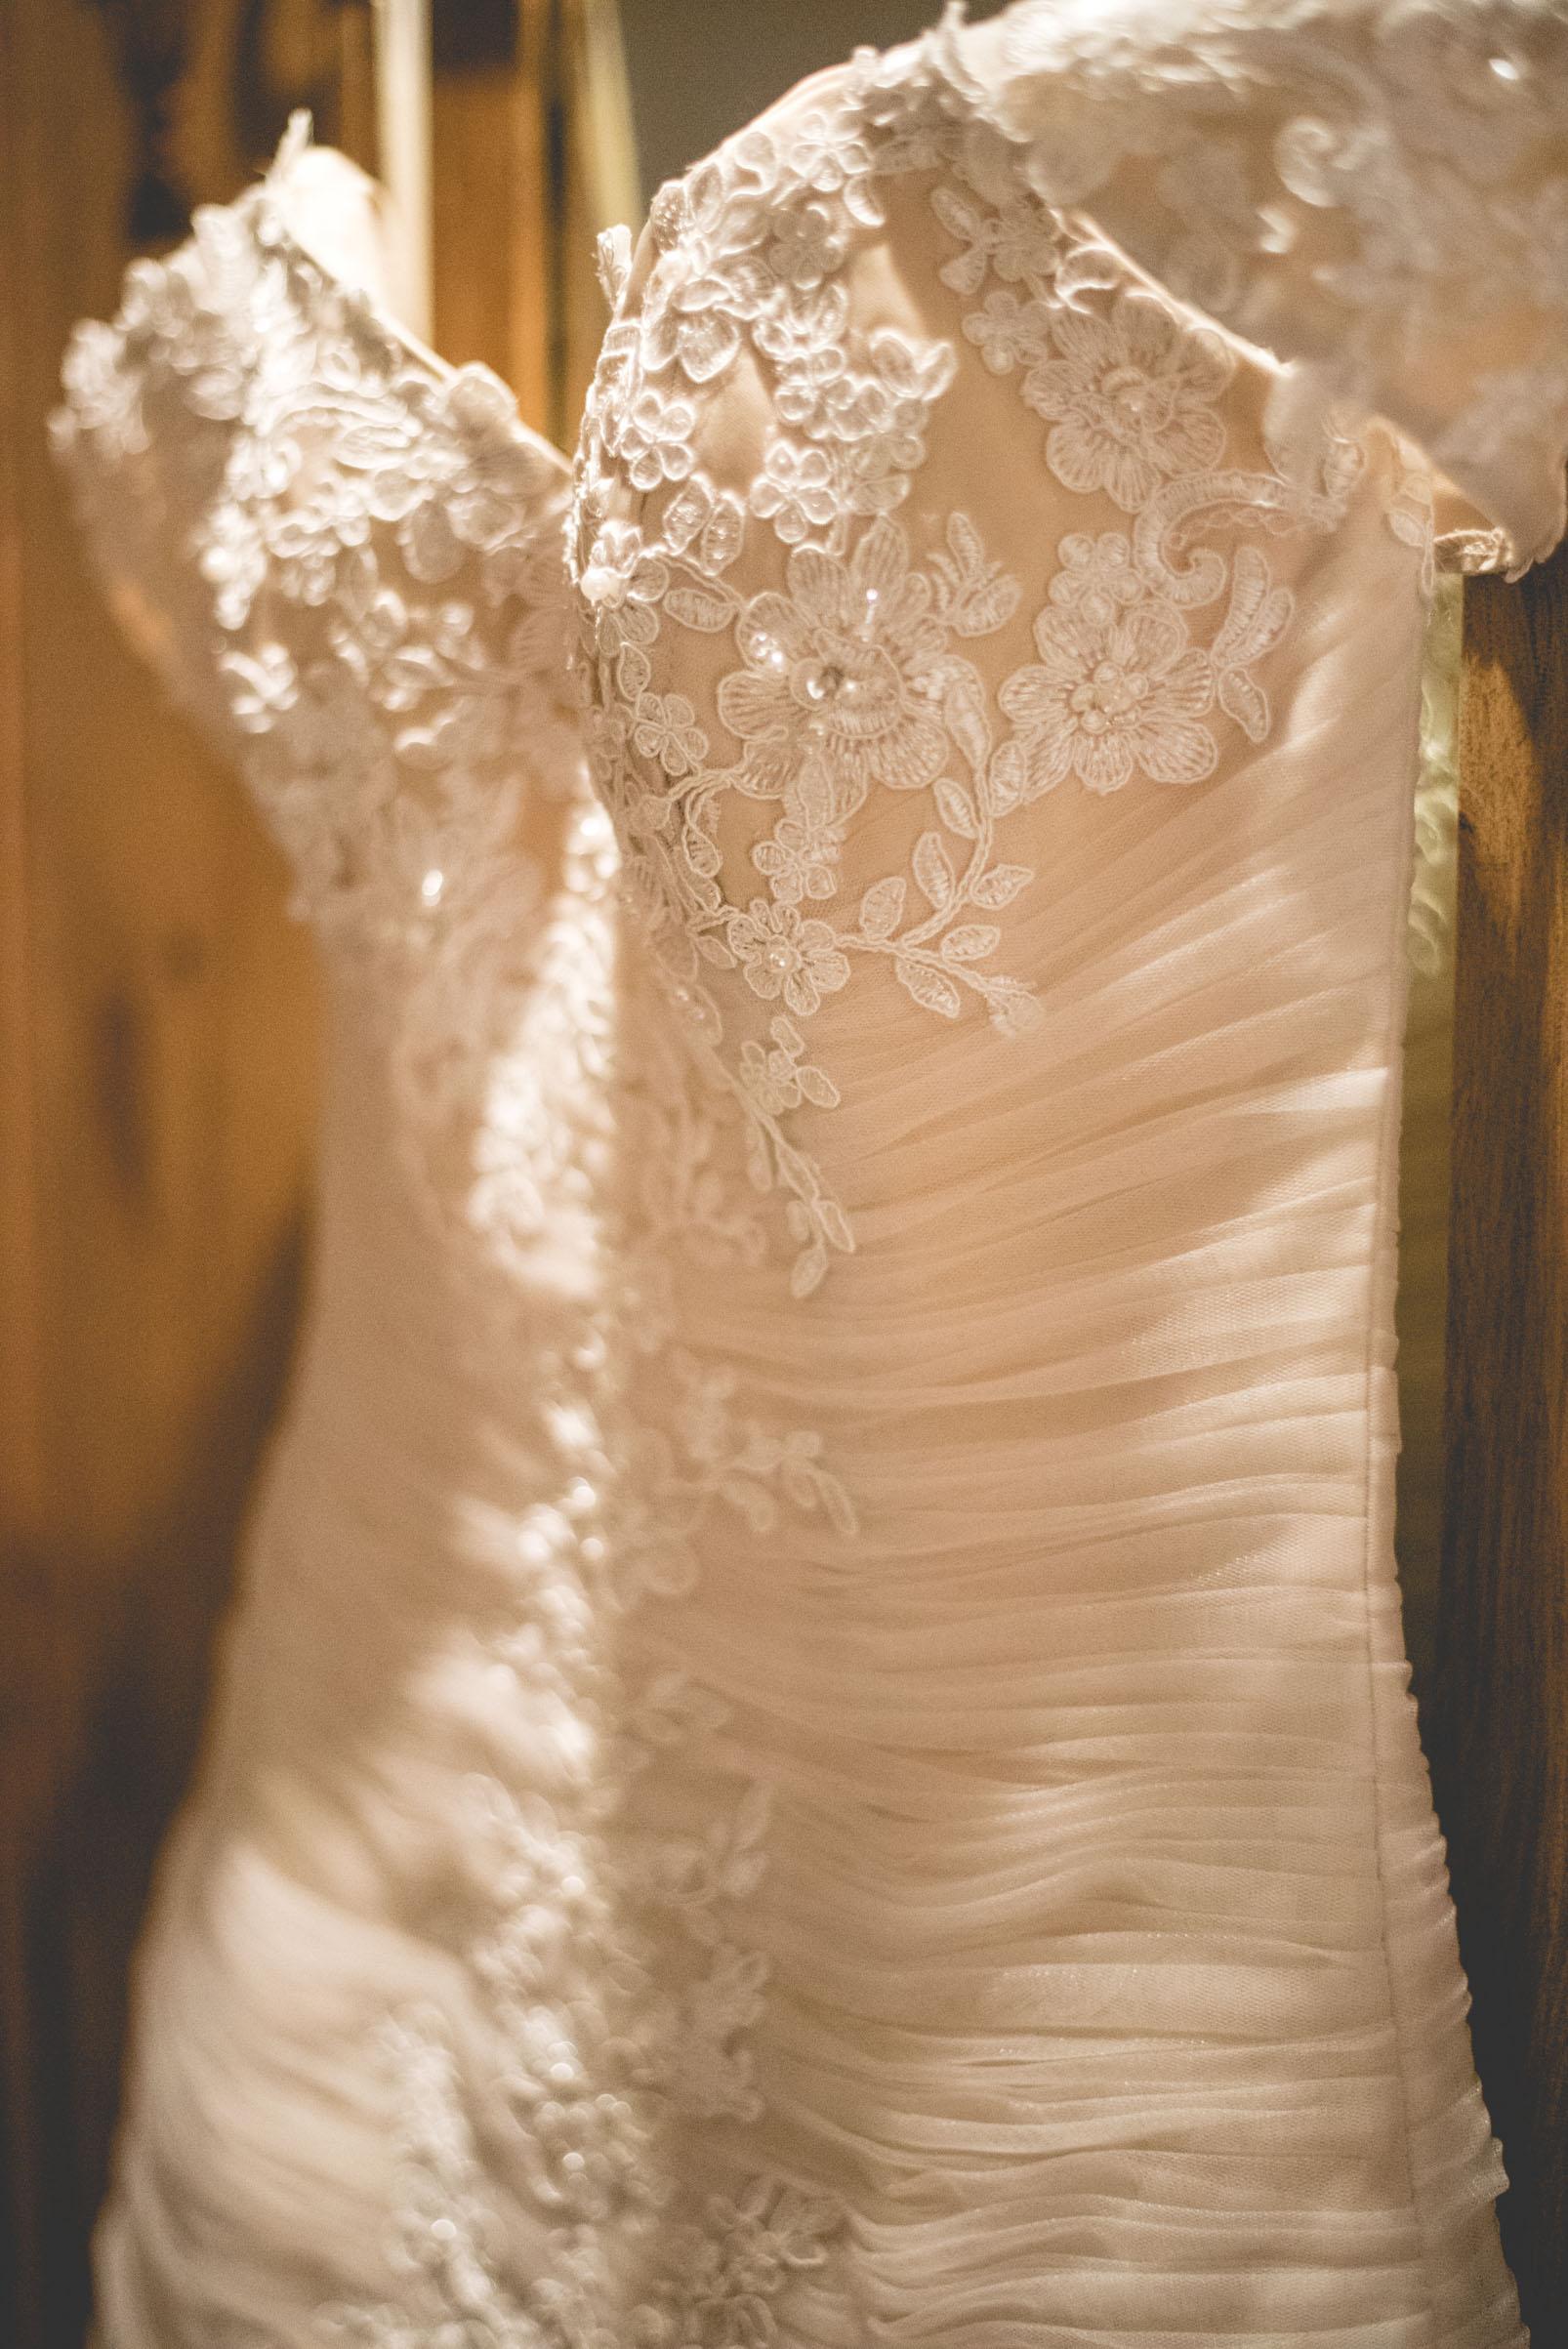 Peak+district+farm+wedding+lower+damgate+photographer-11.jpg